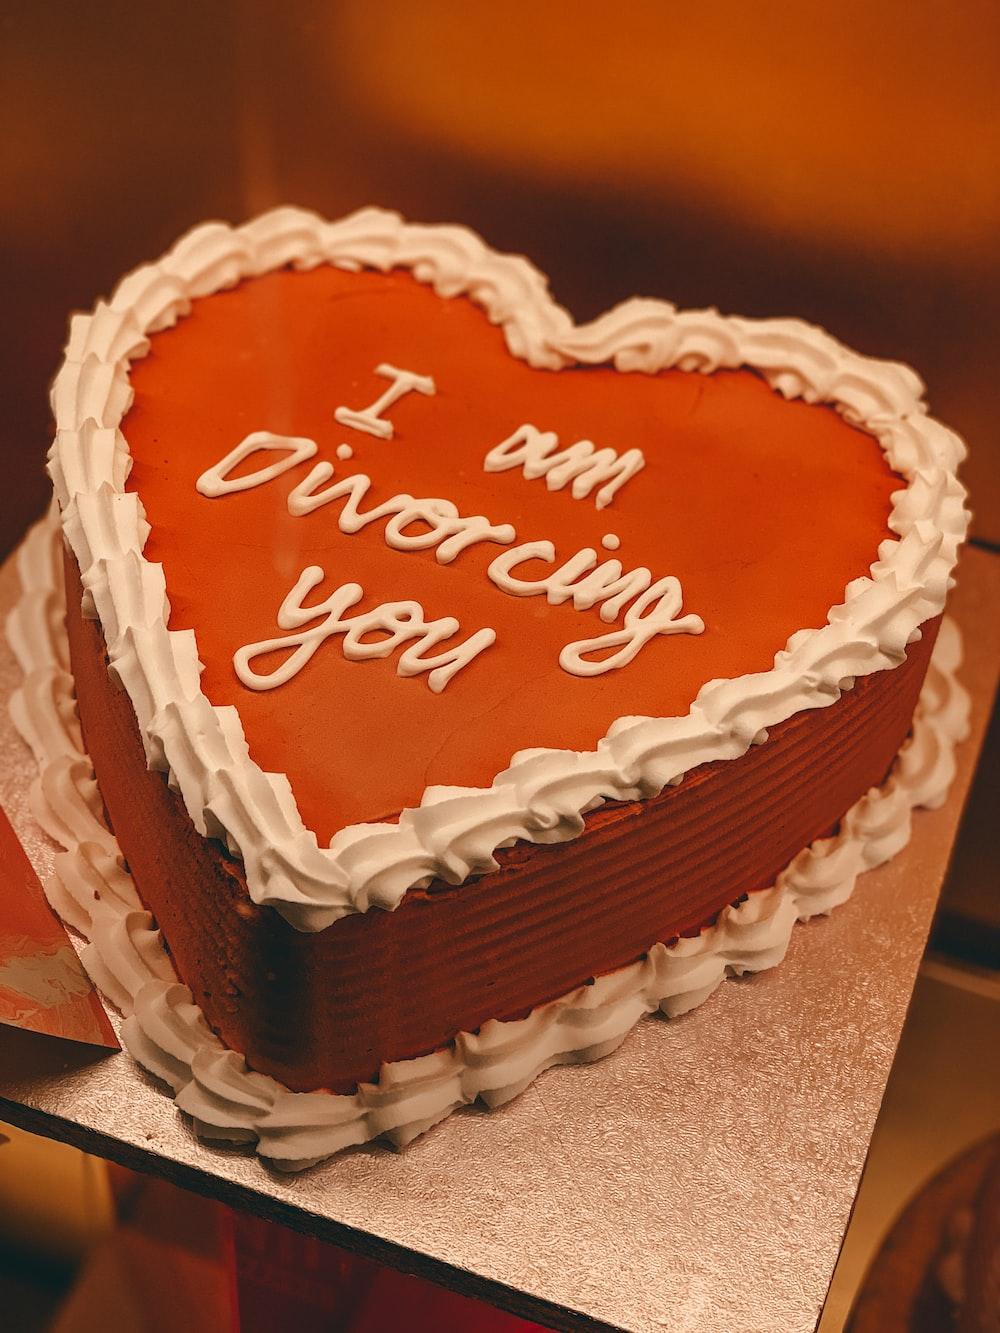 happy birthday cake on brown box